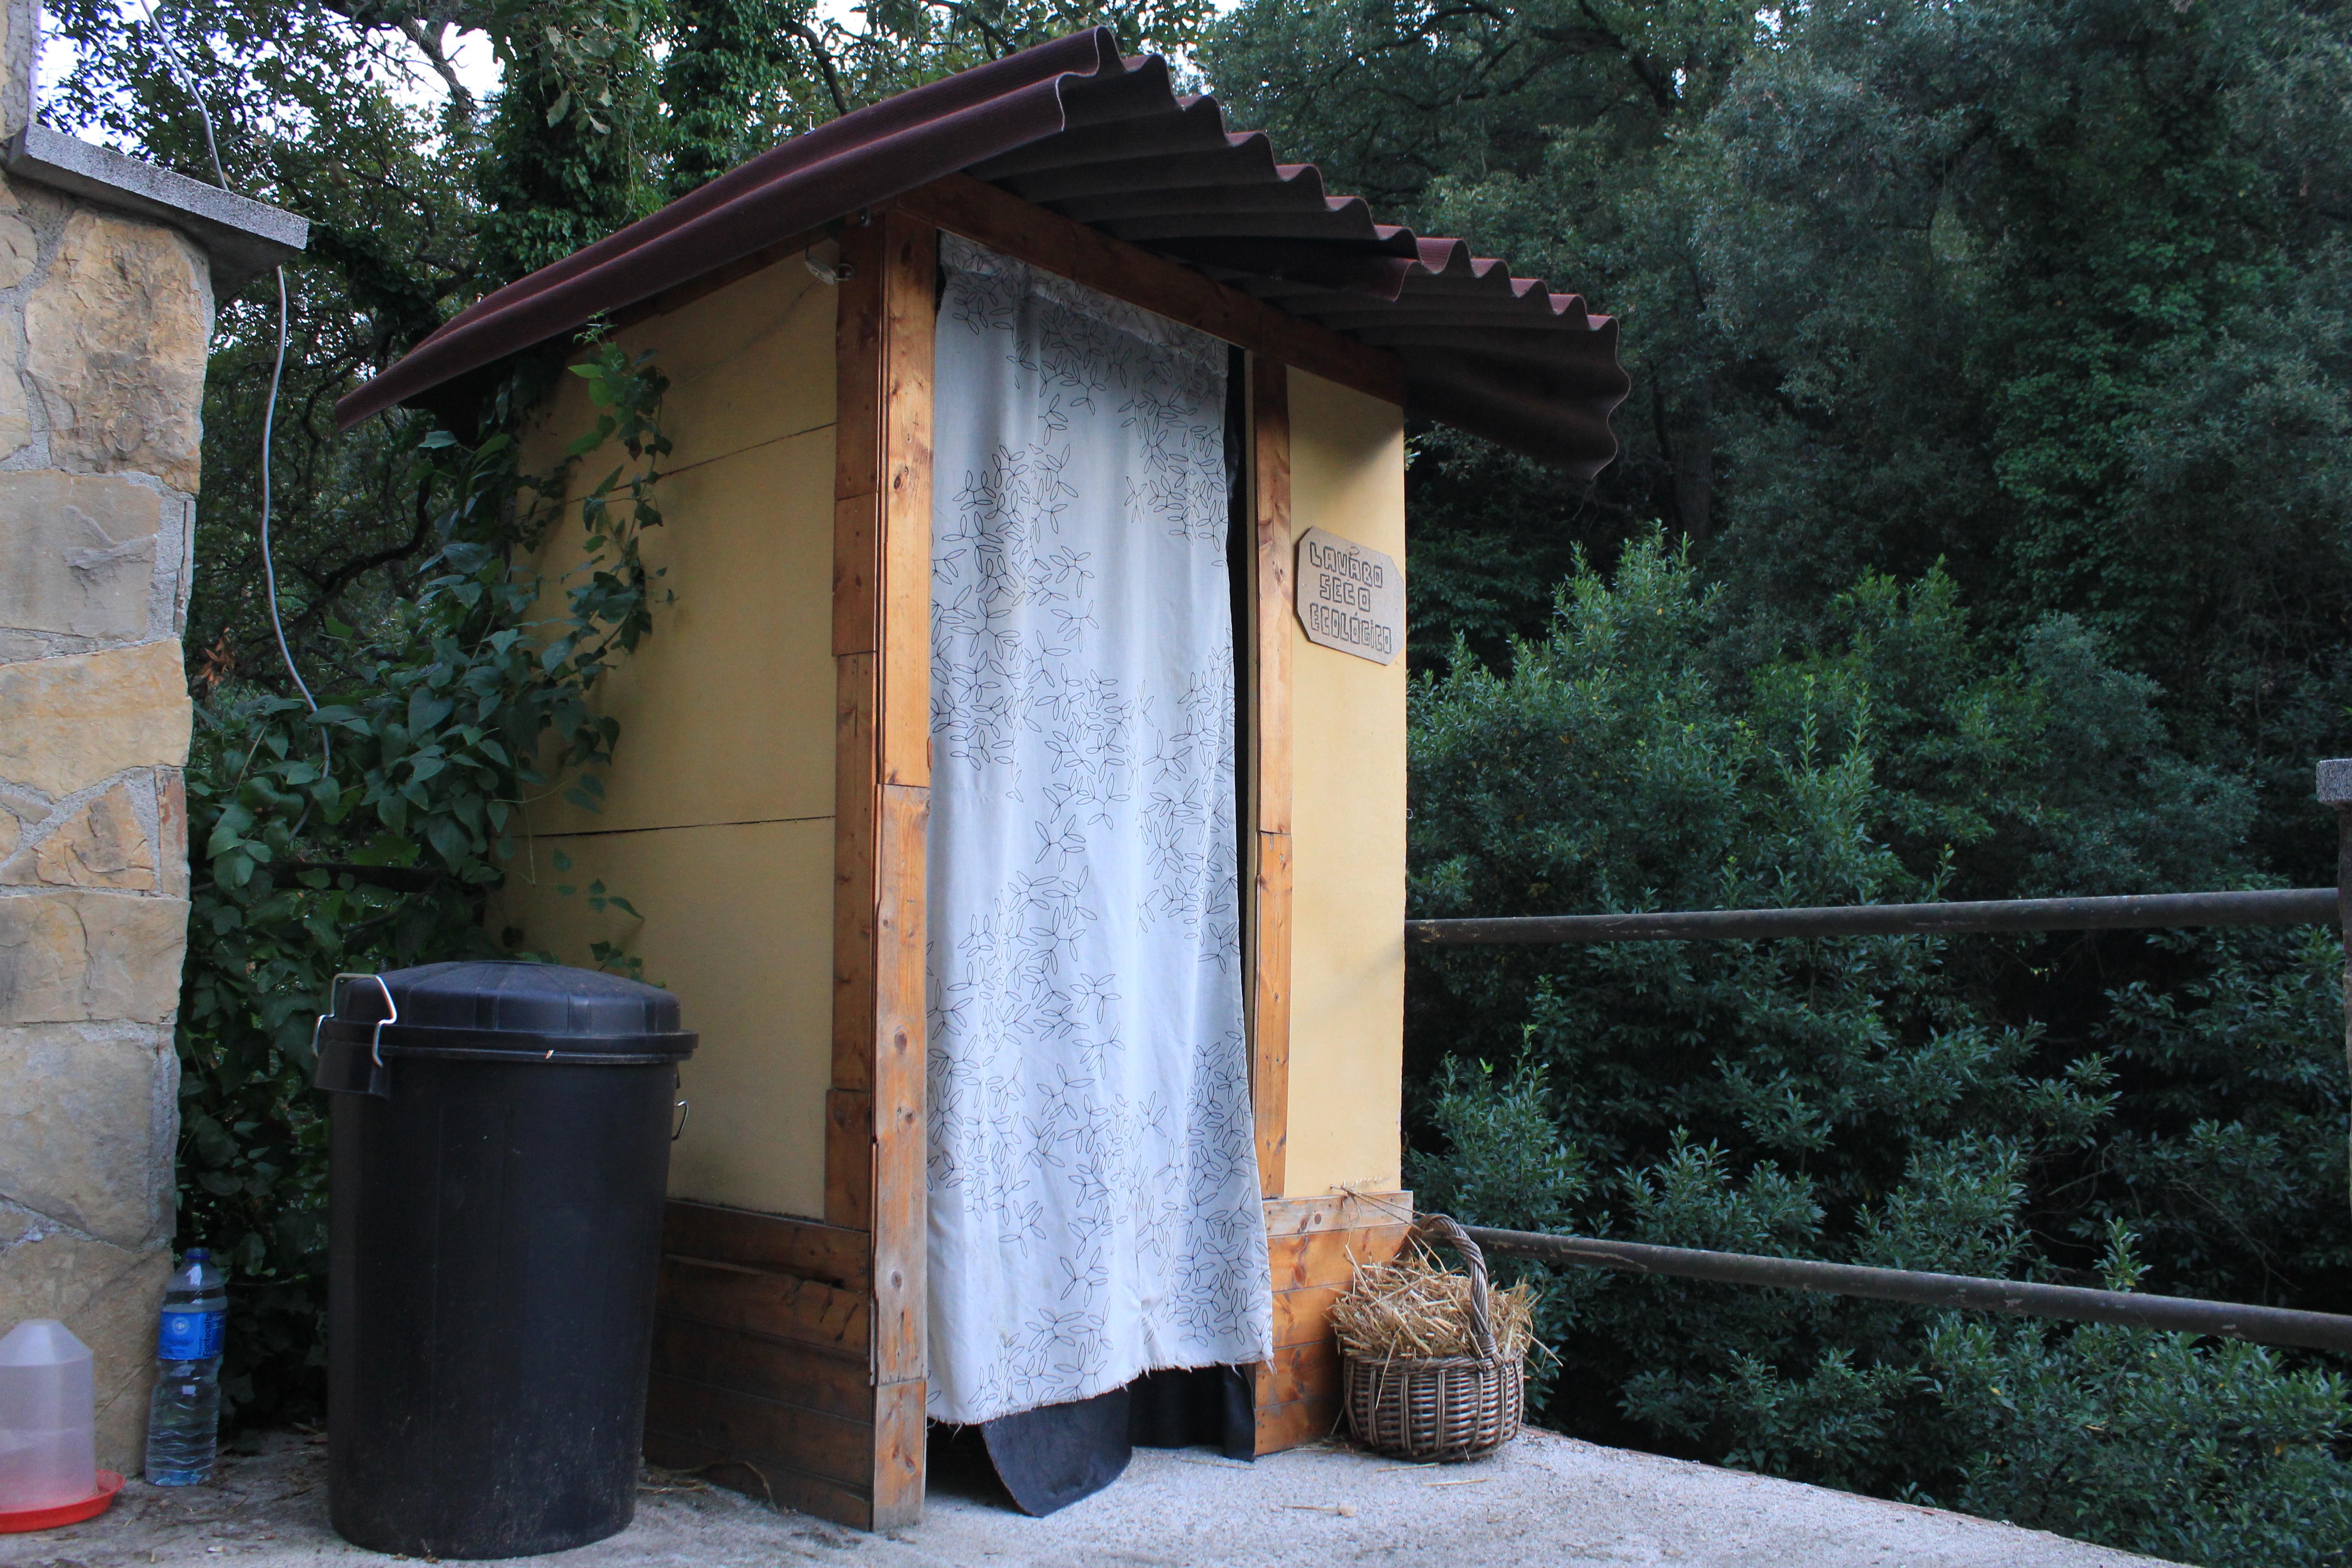 banheiro seco la naranja organica Ecoeficientes #996A32 5184 3456